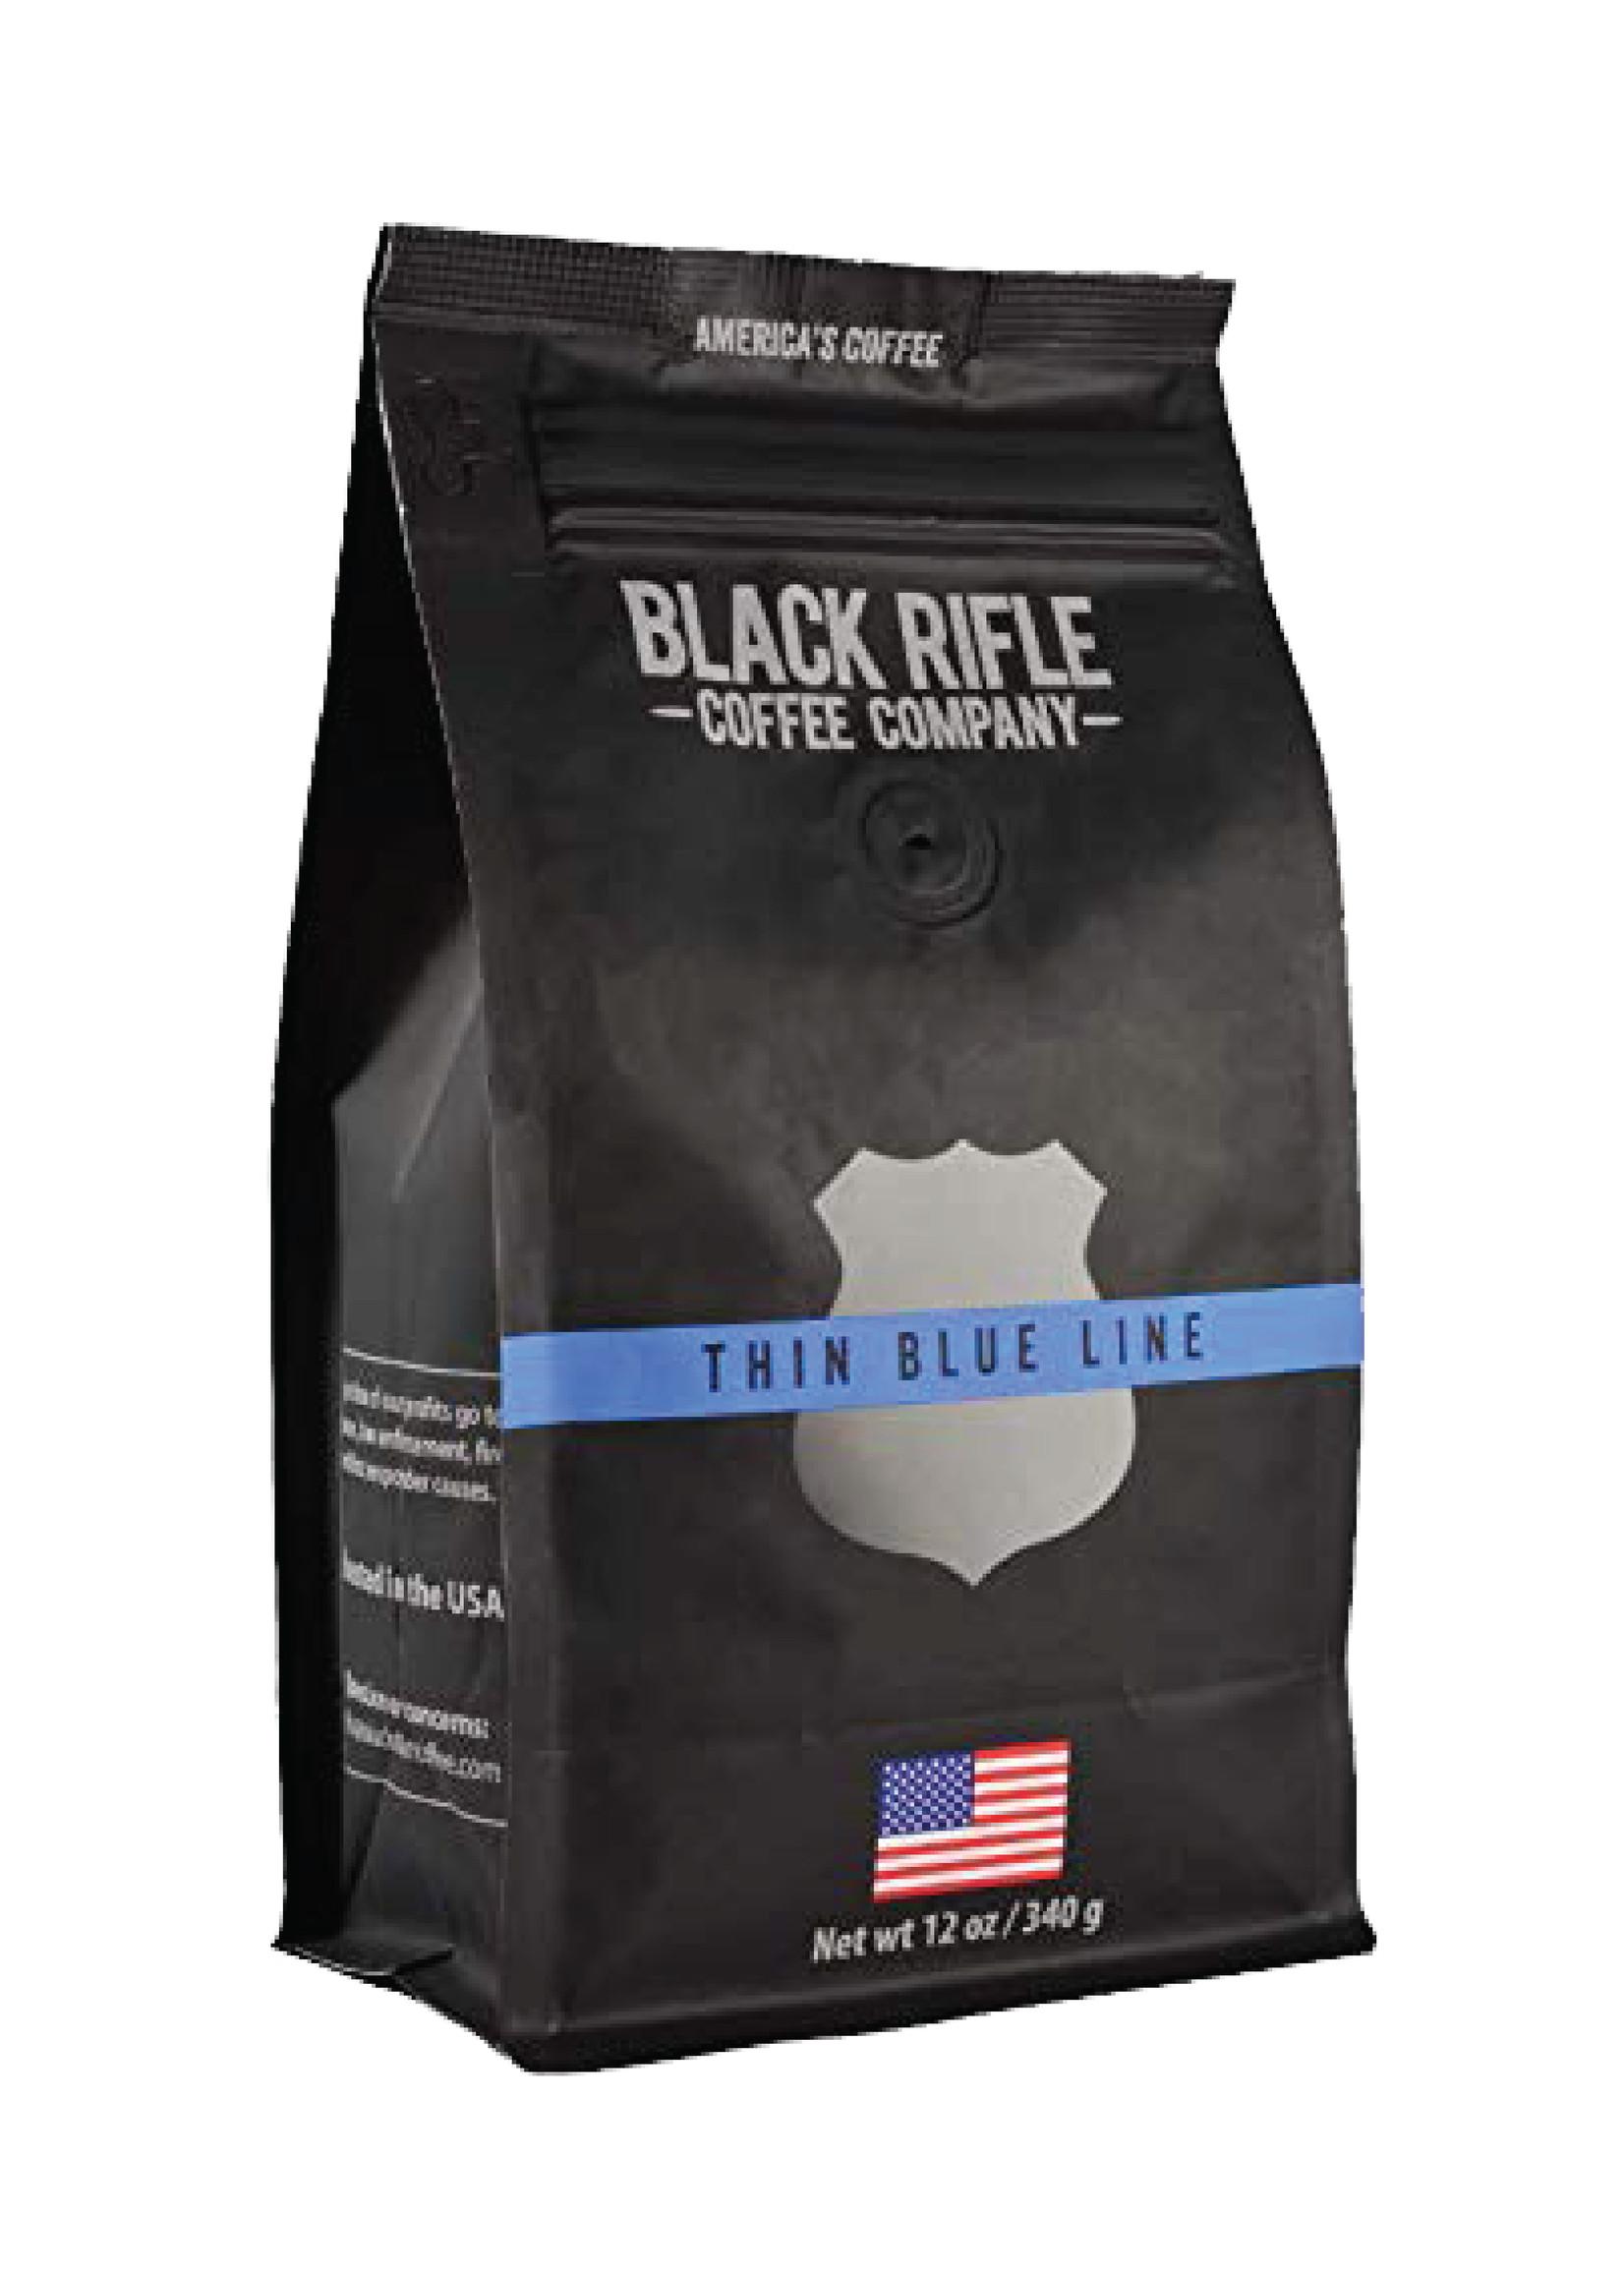 Black Rifle Coffee Company Black Rifle Coffee Company Thin Blue Line Coffee Roast Ground